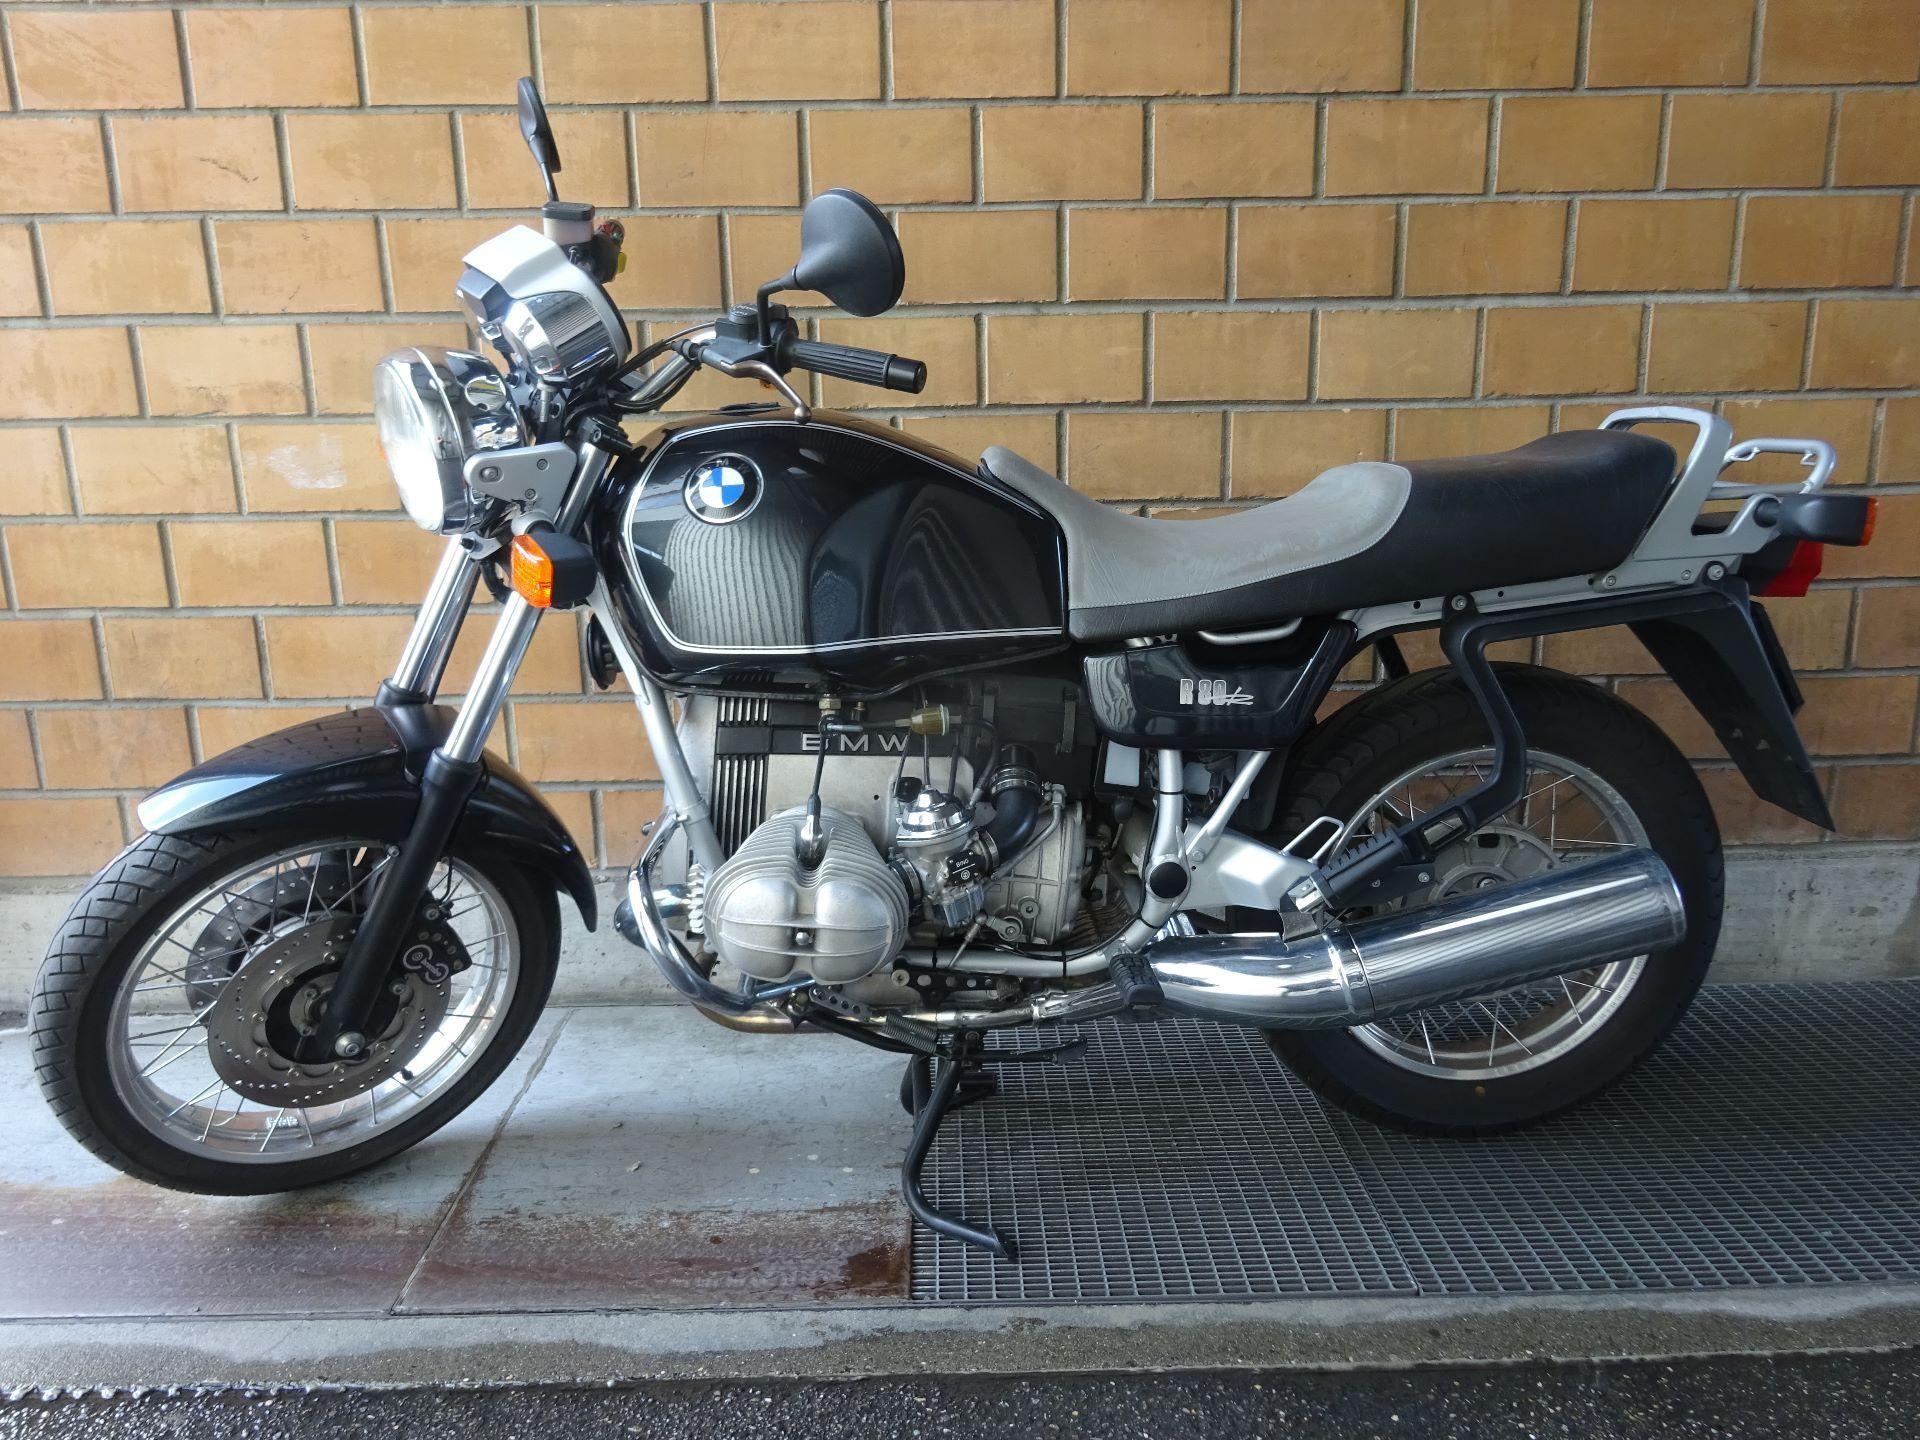 moto occasions acheter bmw r 80 r sacoches motosecours acacias id 7414651. Black Bedroom Furniture Sets. Home Design Ideas